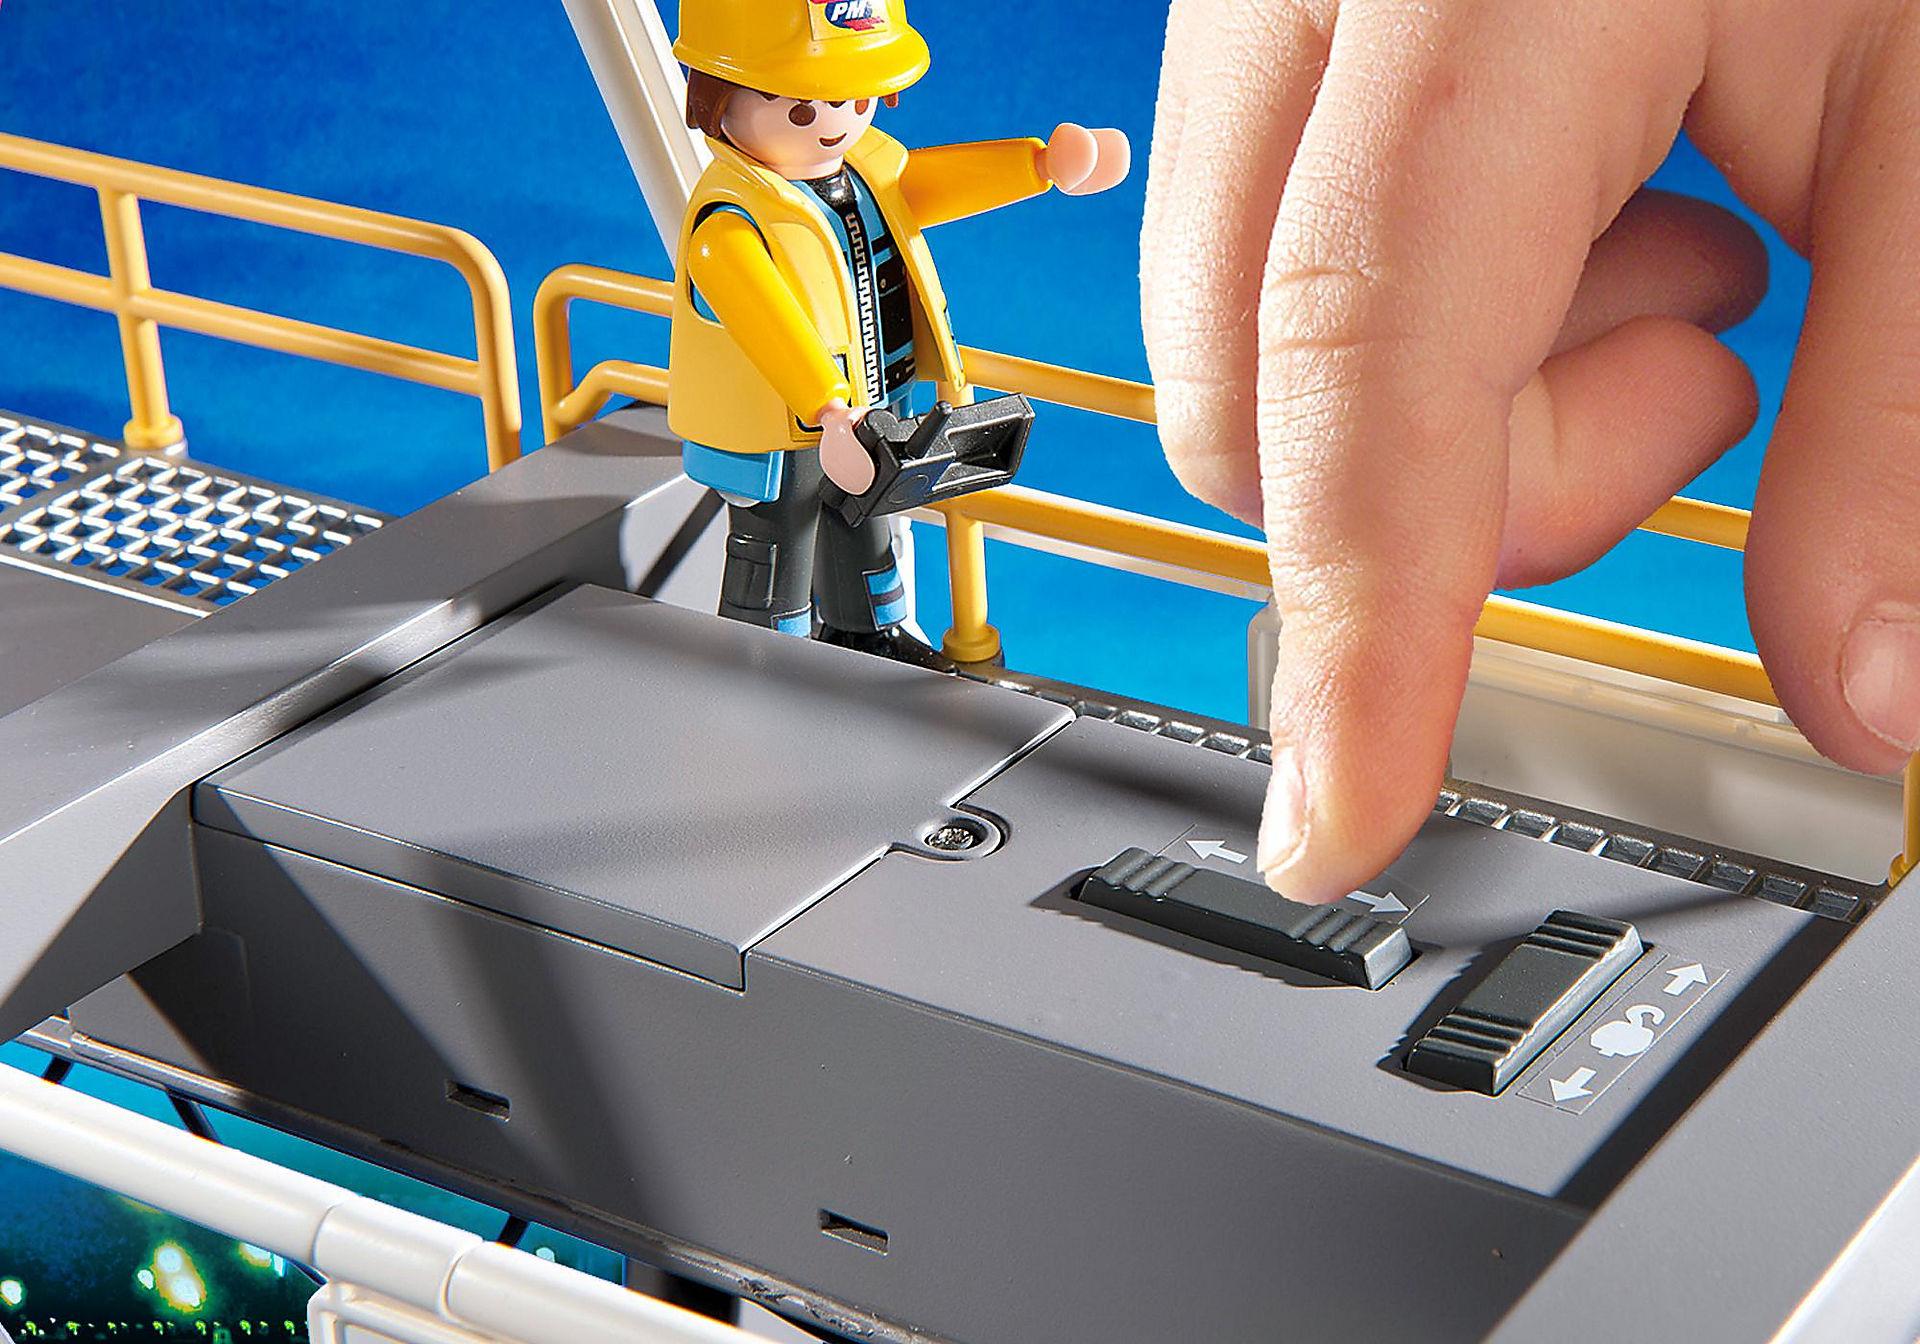 http://media.playmobil.com/i/playmobil/5254_product_extra5/Portique électrique à conteneurs